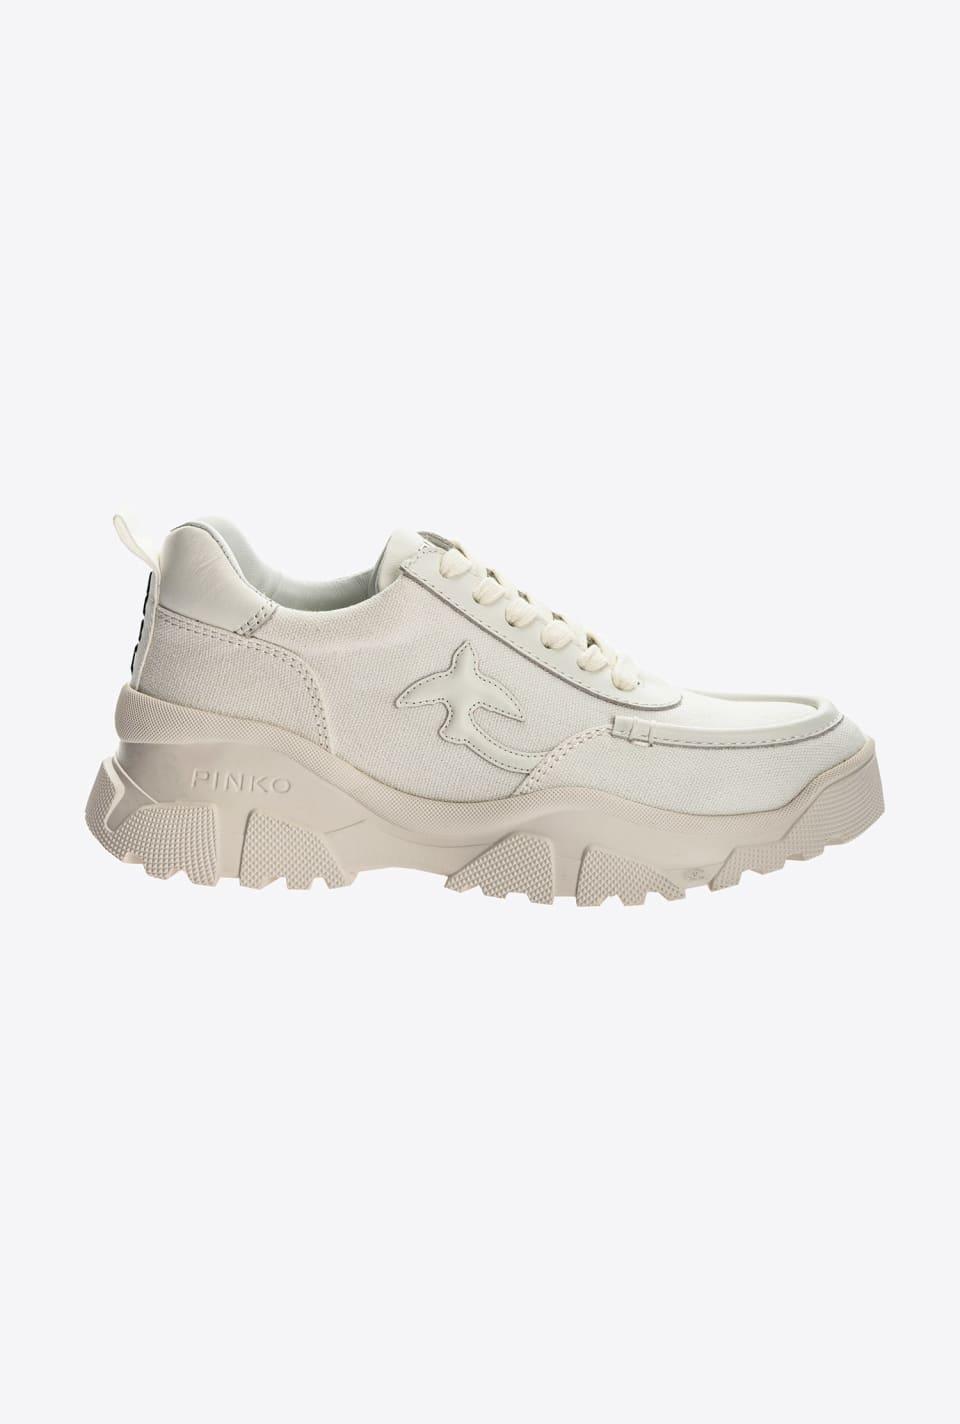 Recycled canvas trek sneakers - Pinko